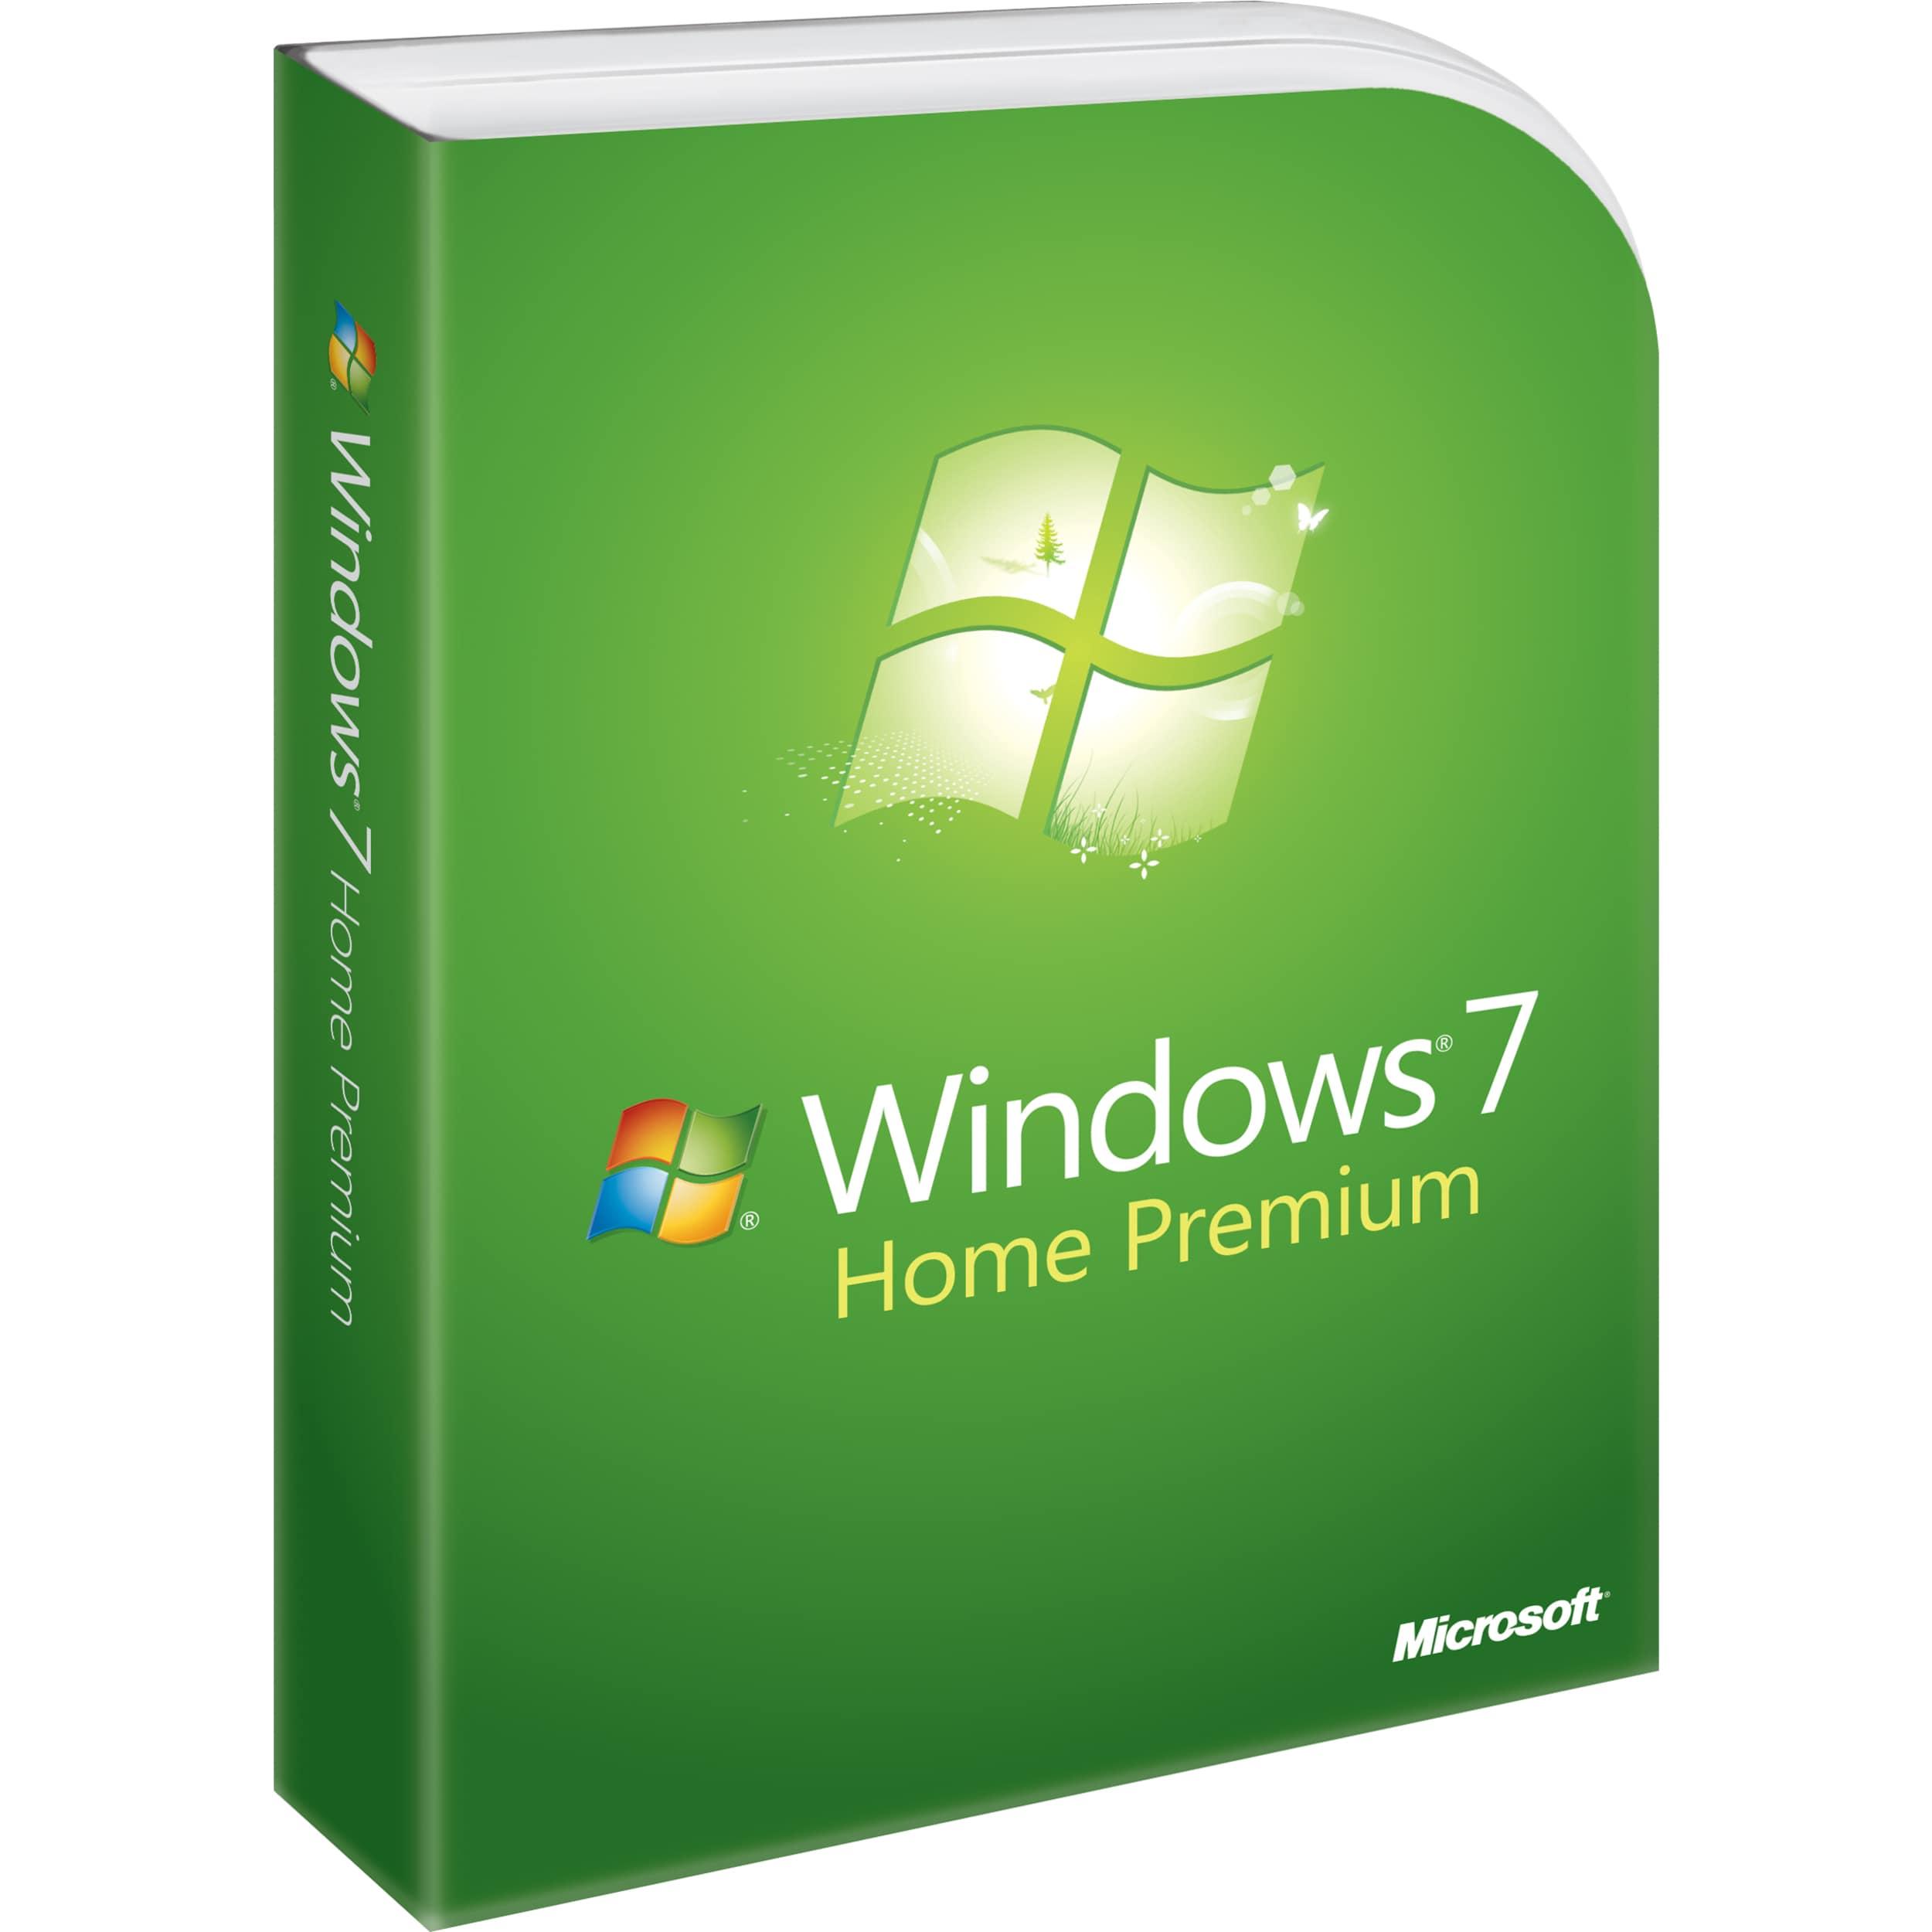 Microsoft Windows 7 Home Premium With Service Pack 1 64-bit - License